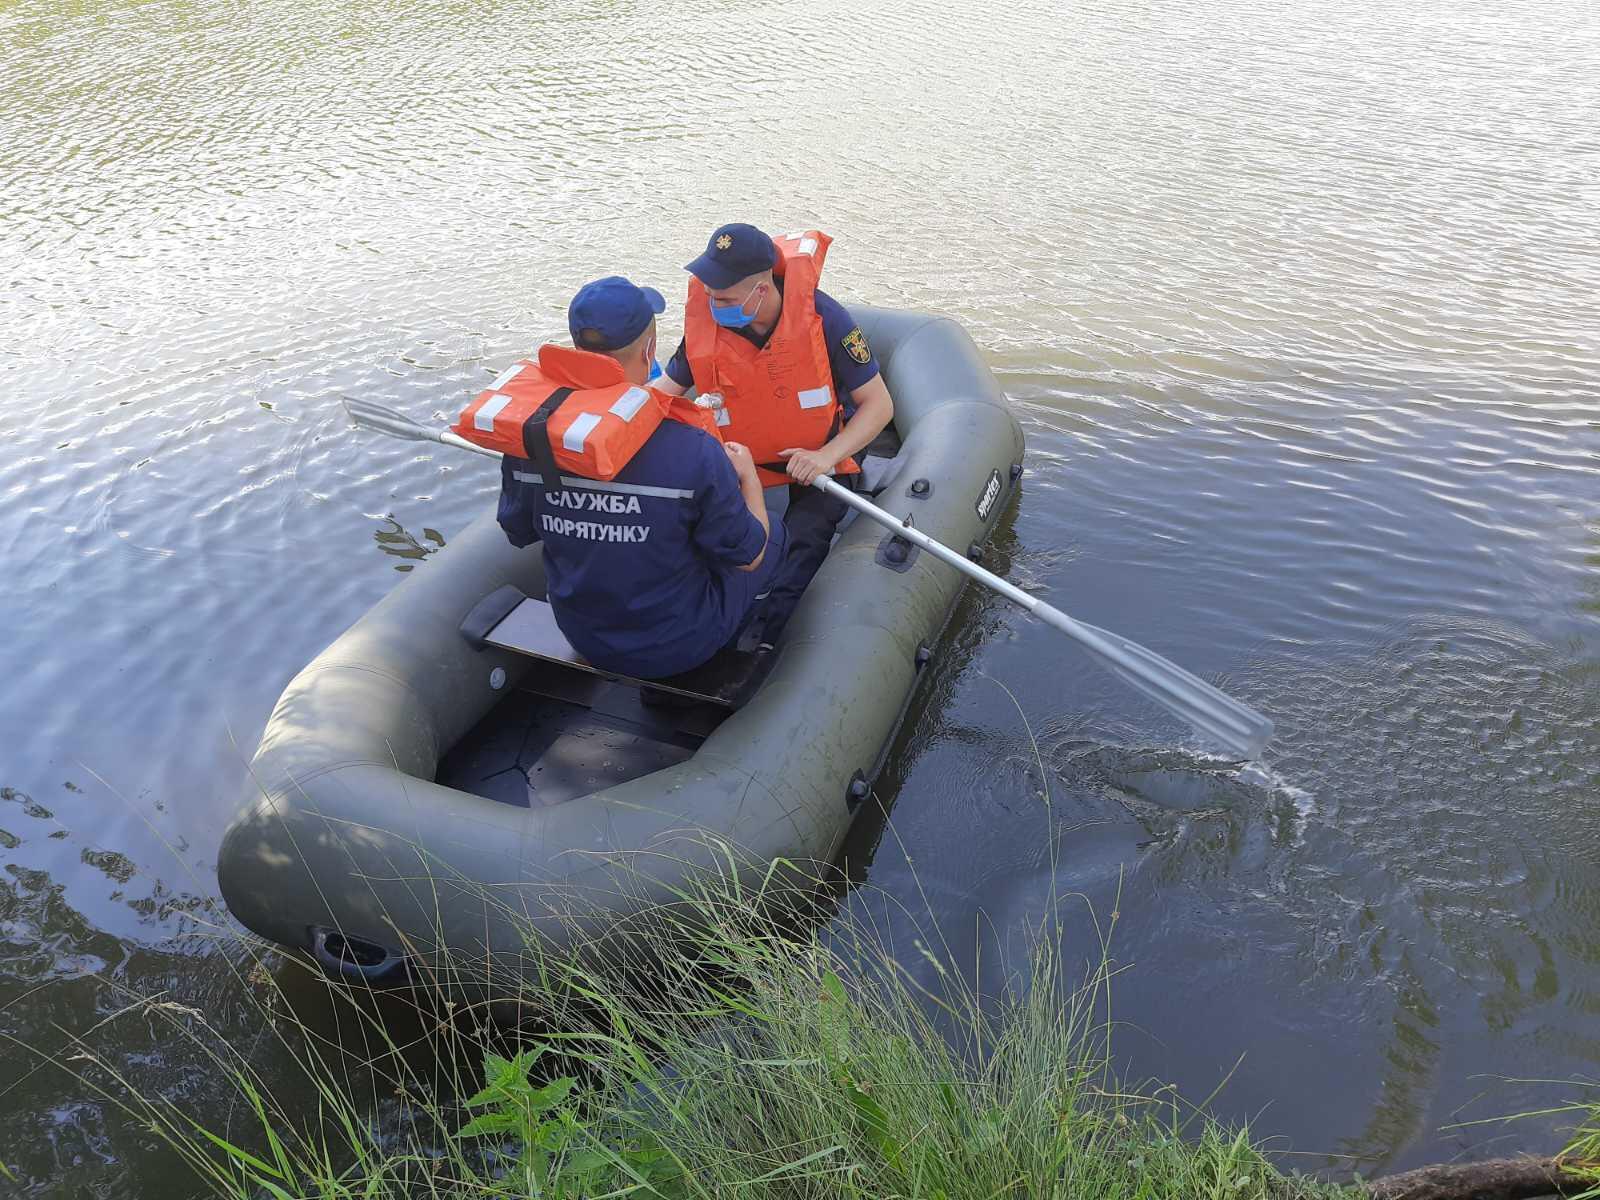 Тiло 39-рiчного чоловiка вилучили з води рятувальники Кiровоградщини (ФОТО)